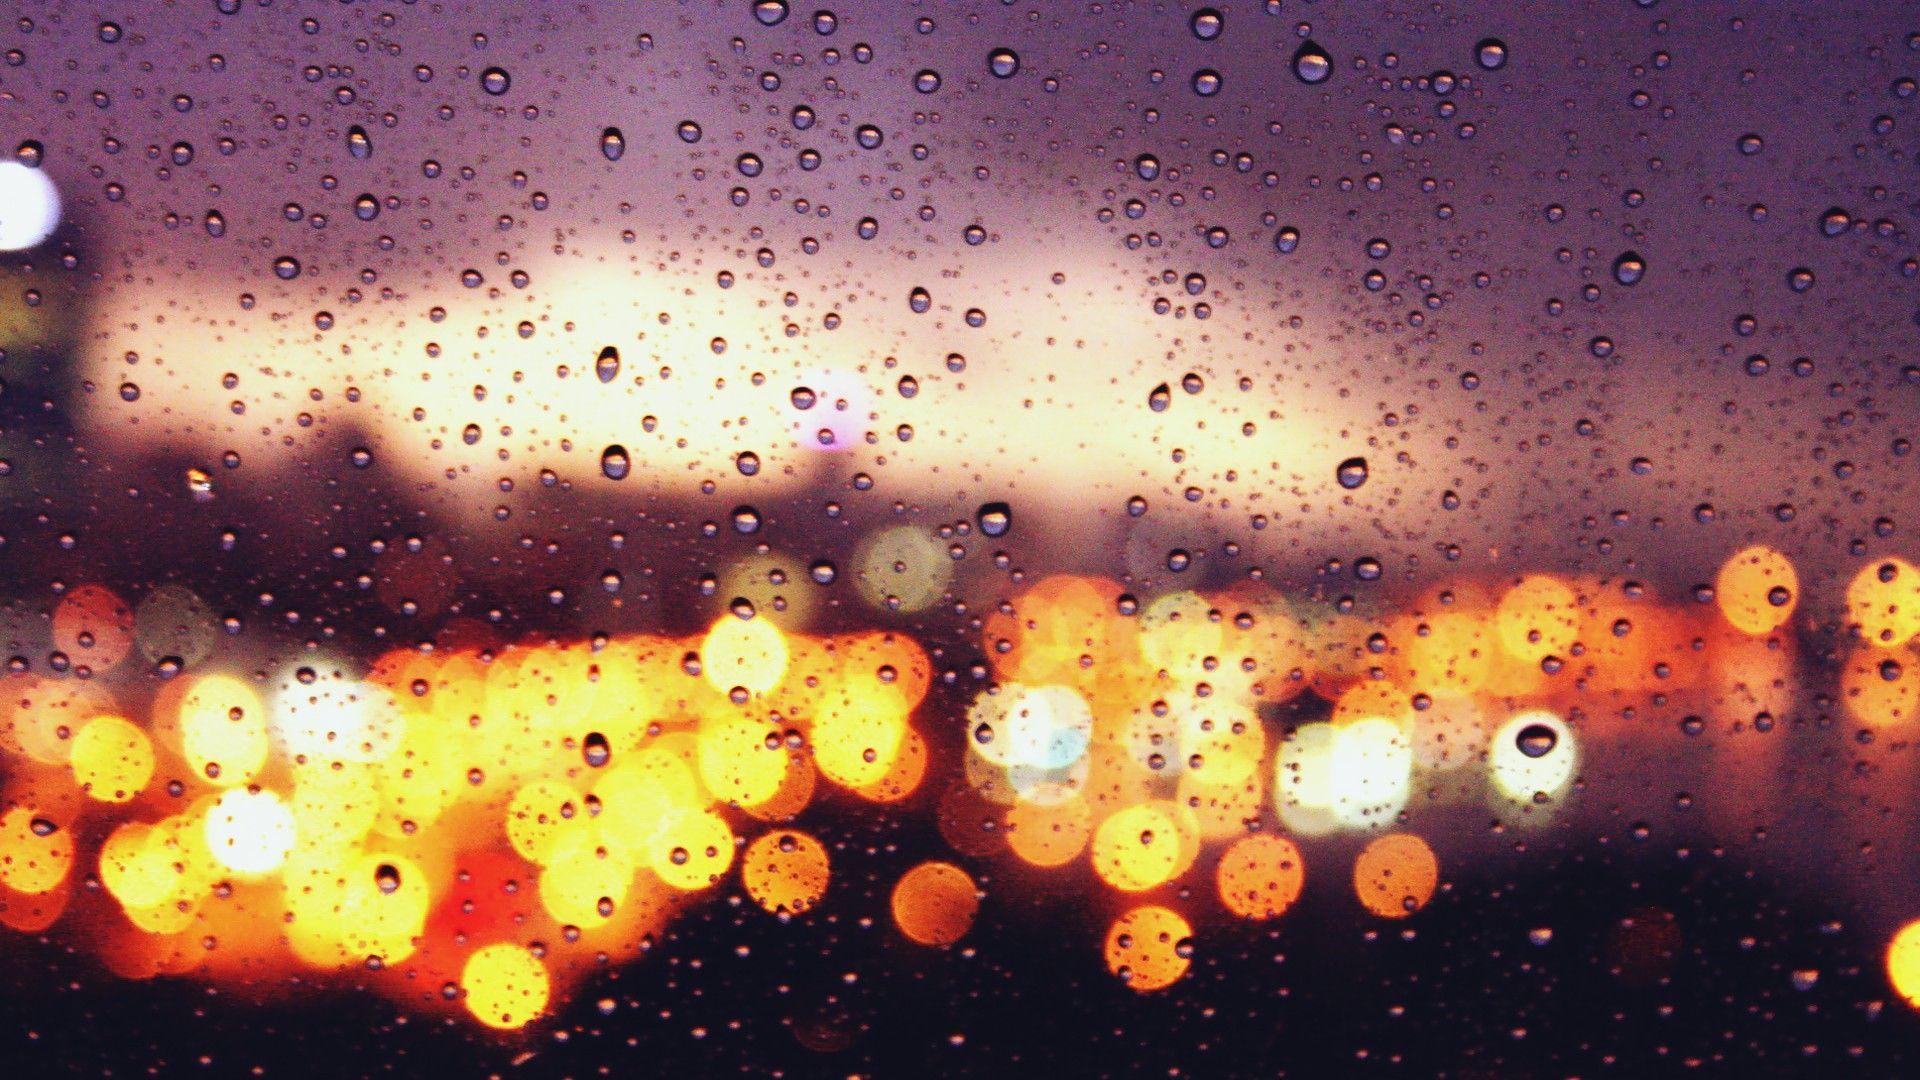 Rain Bokeh Wallpapers Top Free Rain Bokeh Backgrounds